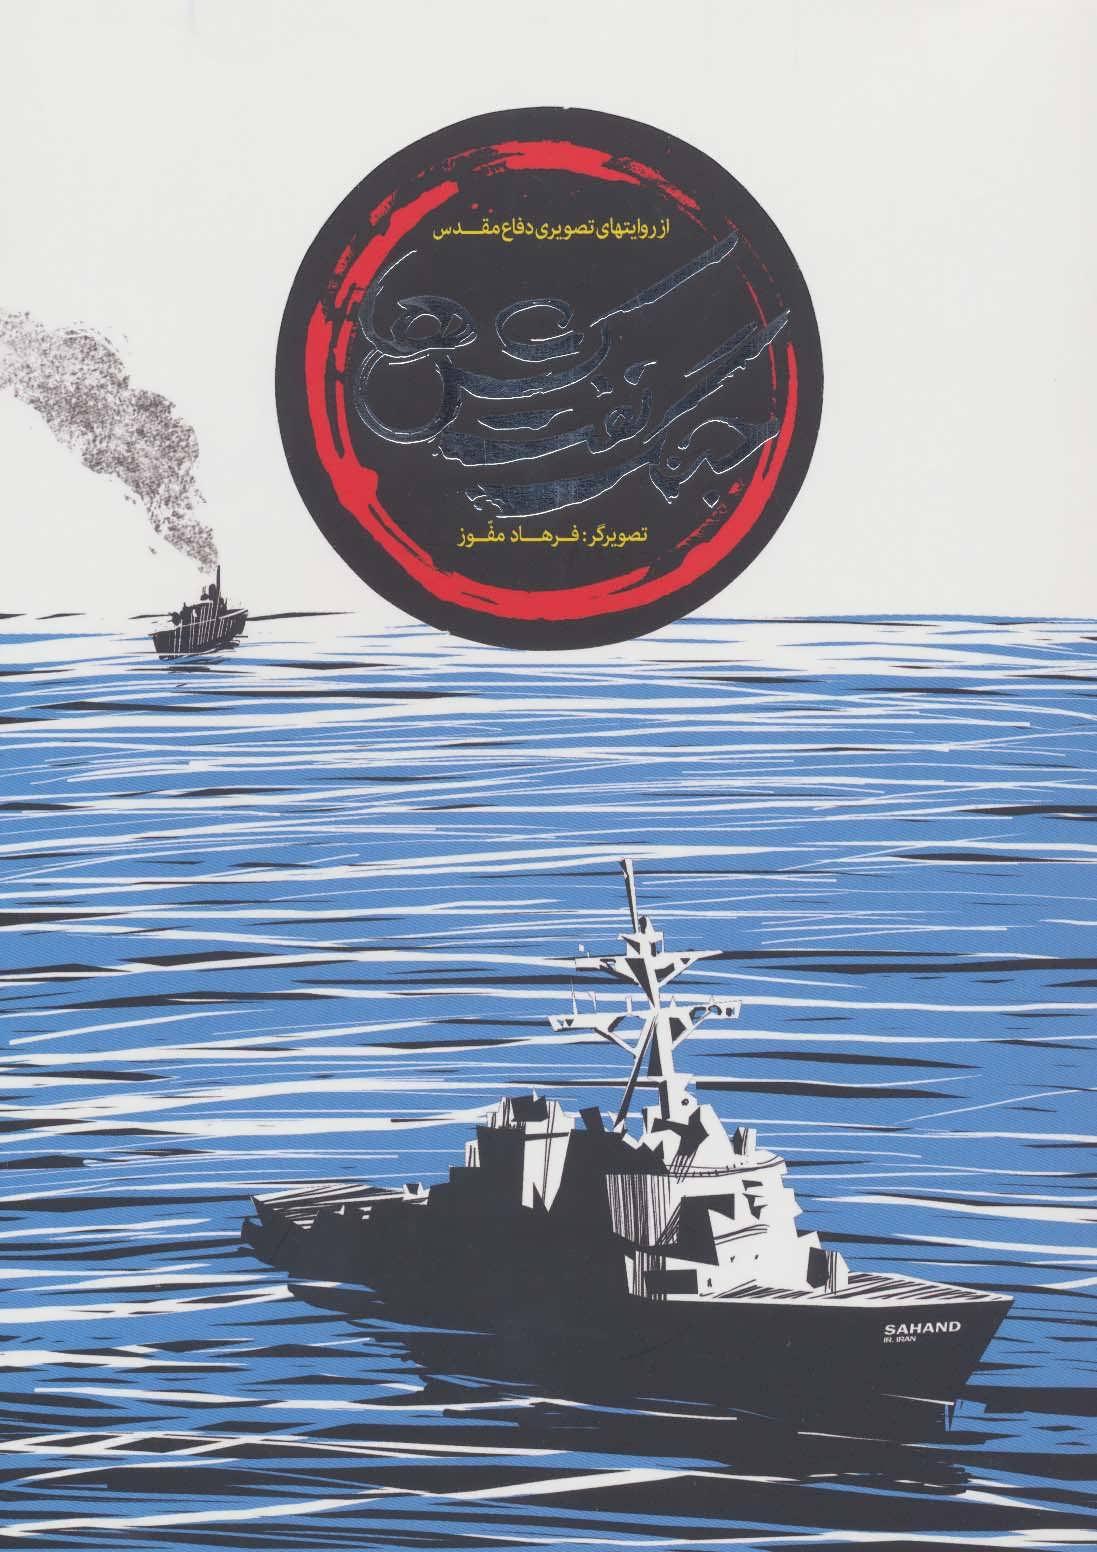 کتاب جنگ نفتکشها